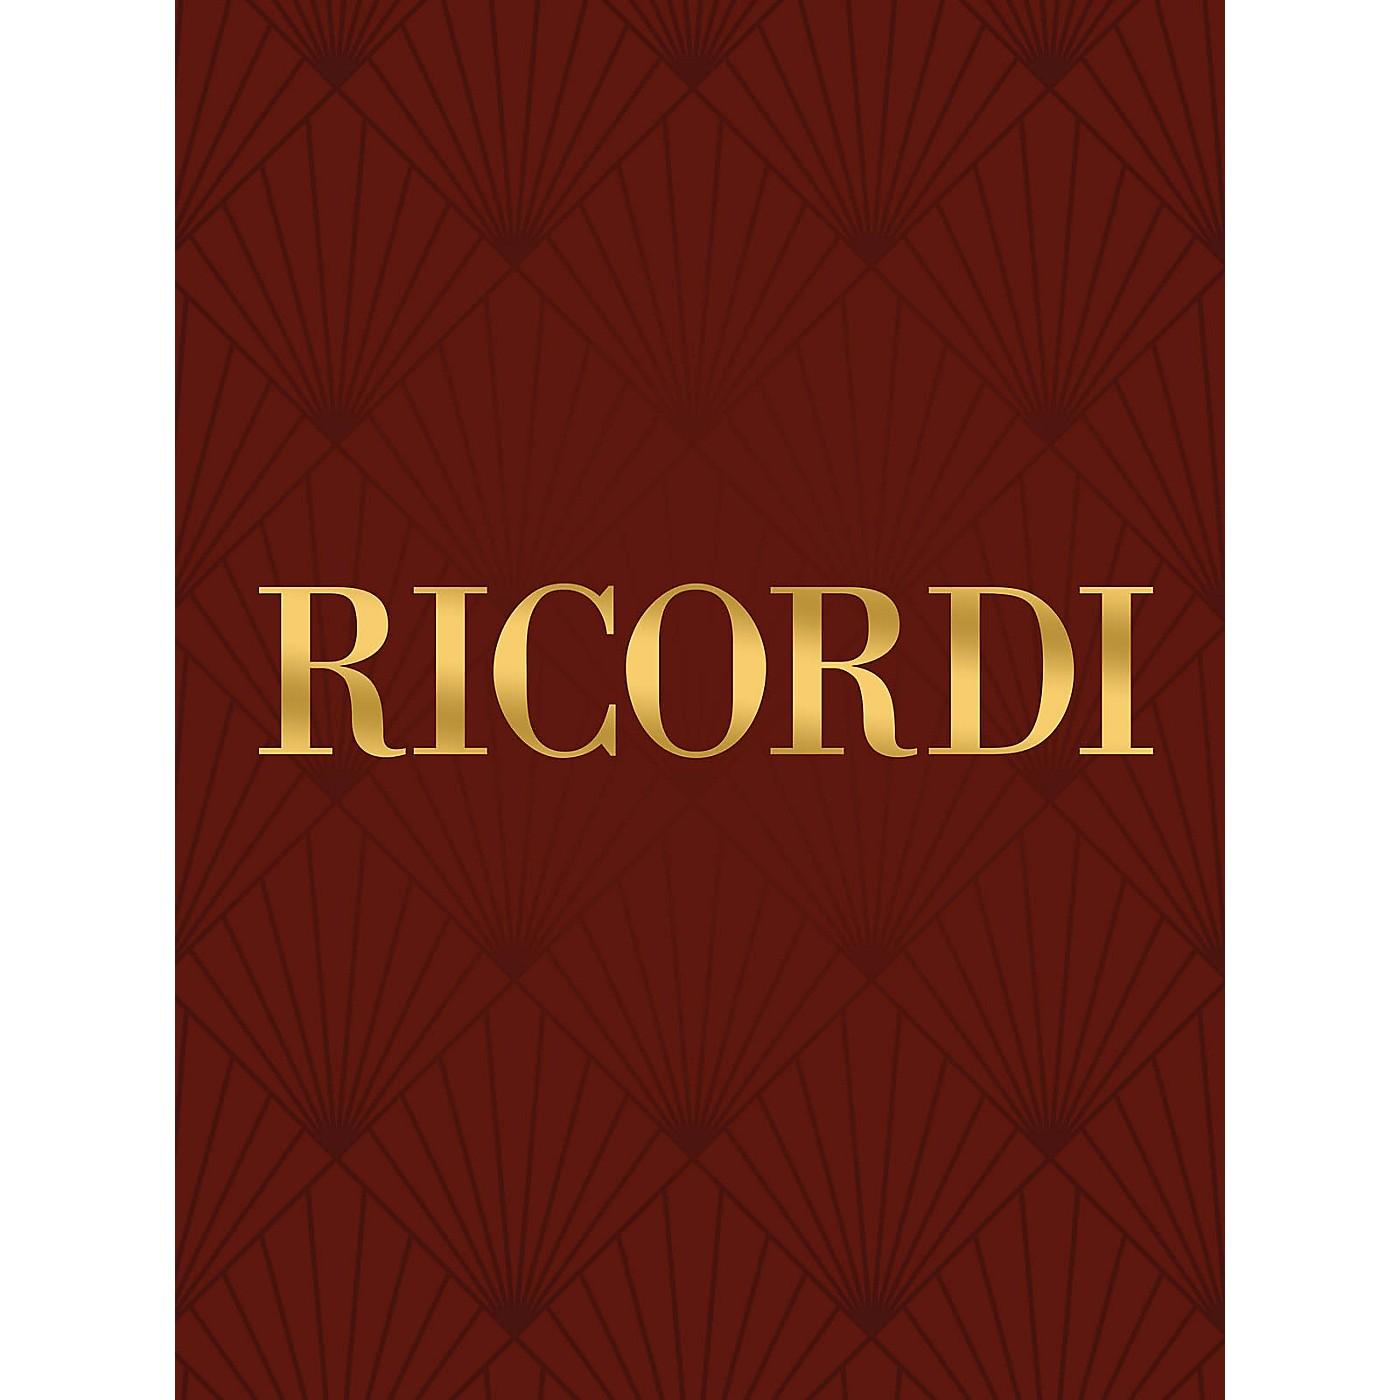 Ricordi La Cinque Dita, Op. 777 (24 Melodie facilissime su 5 note) Piano Method by Czerny Edited by Buonamici thumbnail